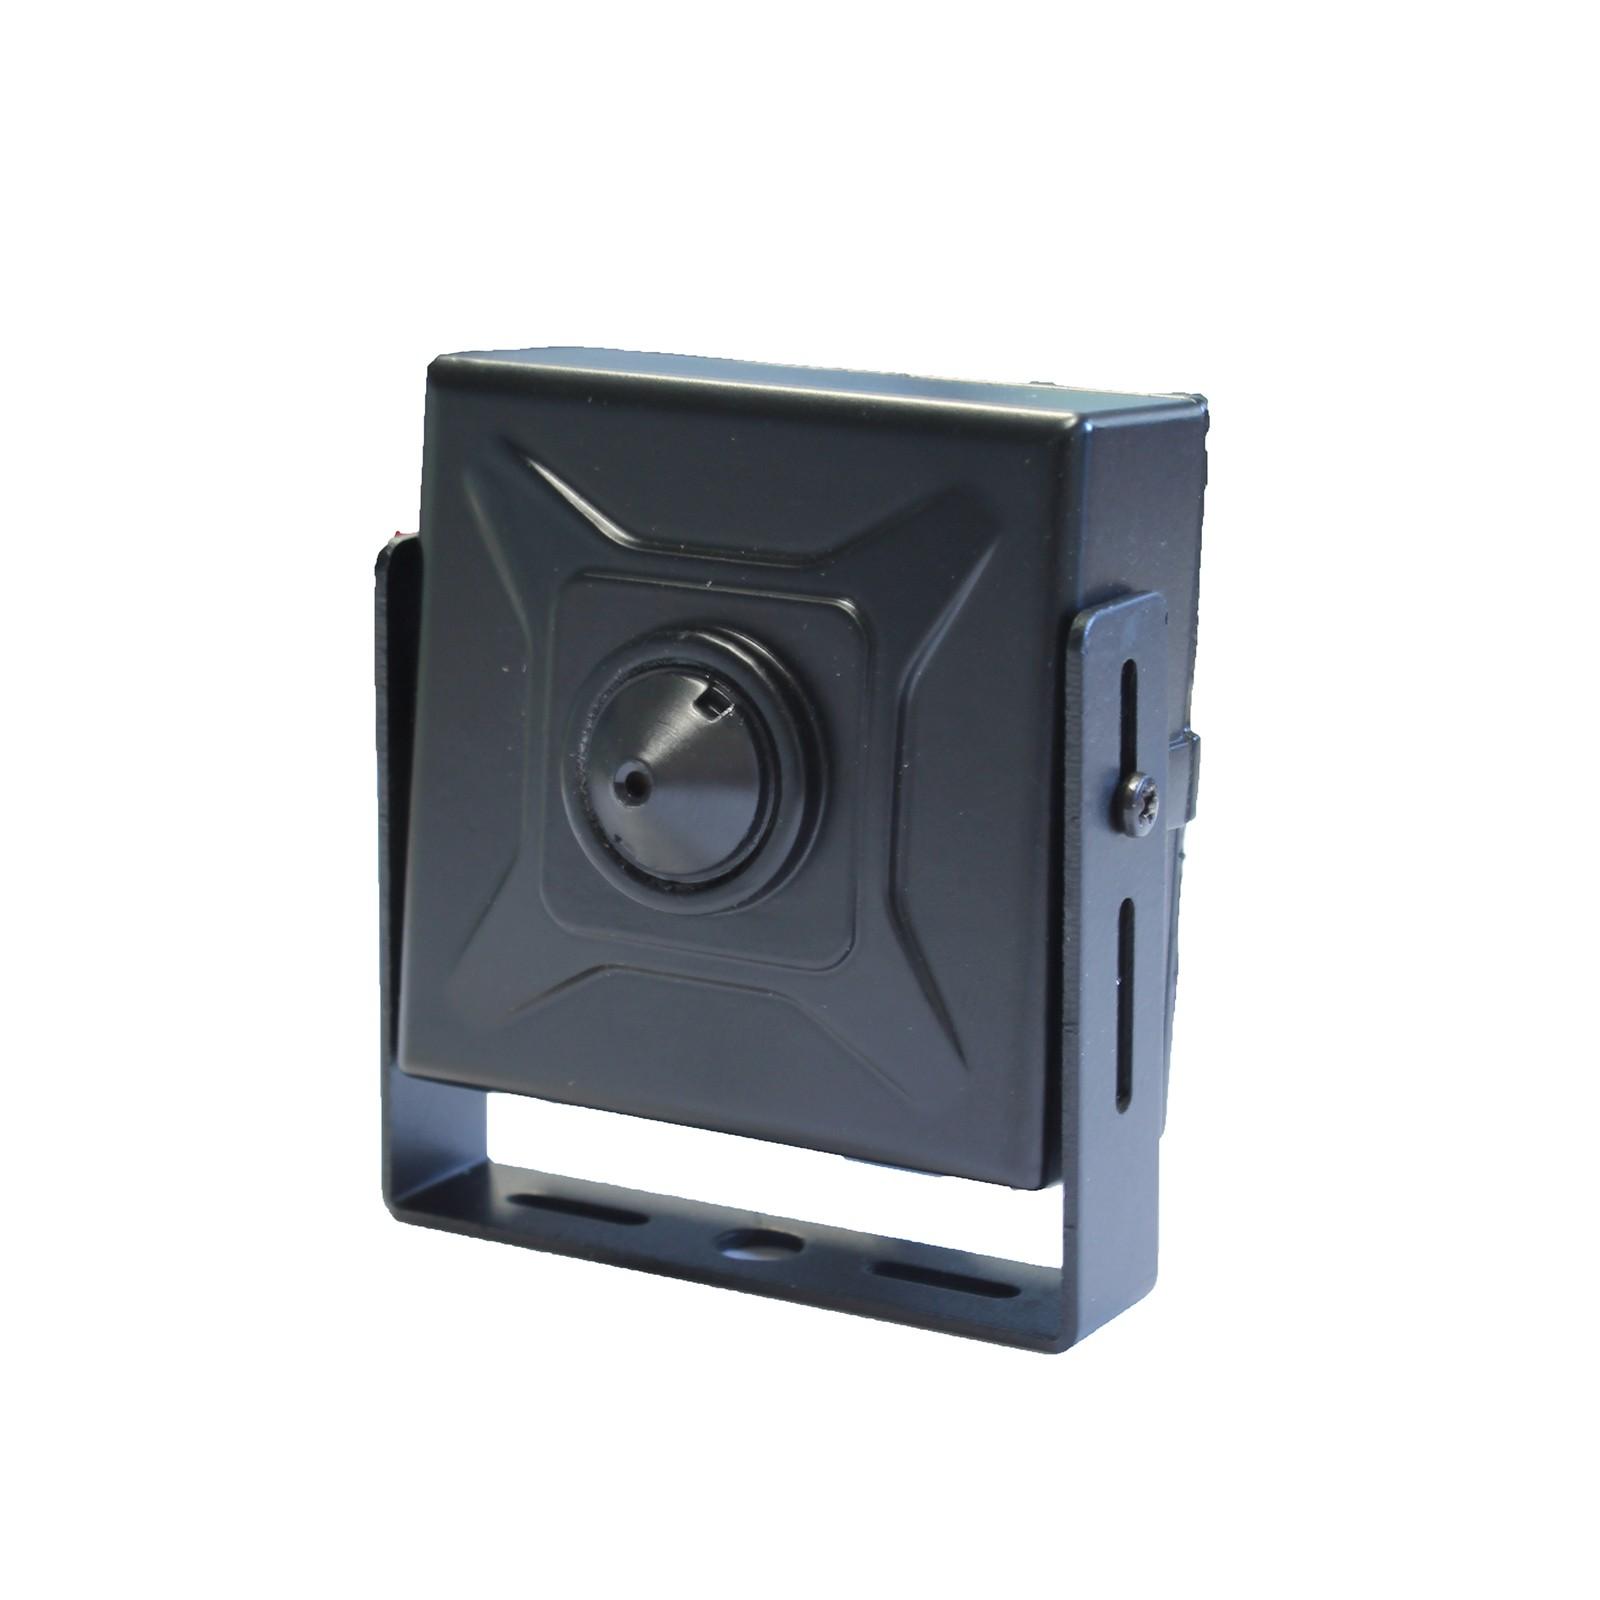 Hdhyb1mpx36 telecamera nascosta ibrida 4in1 analogica - Camera nascosta in bagno ...